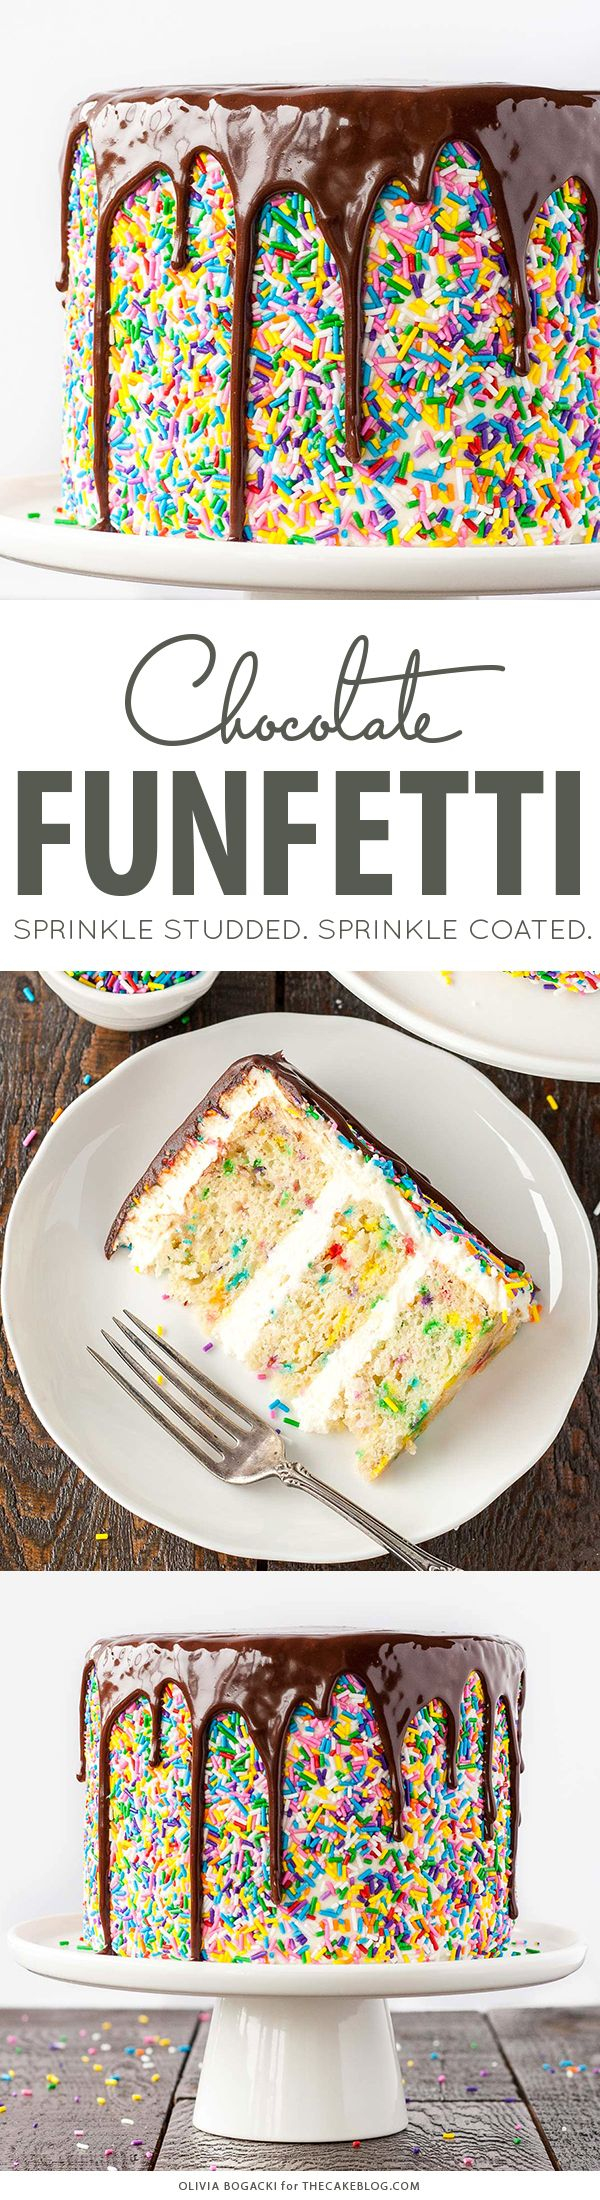 Funfetti Sprinkle Cake  ...♥♥...    with Drippy Chocolate Ganache | by Olivia Bogacki for TheCakeBlog.com